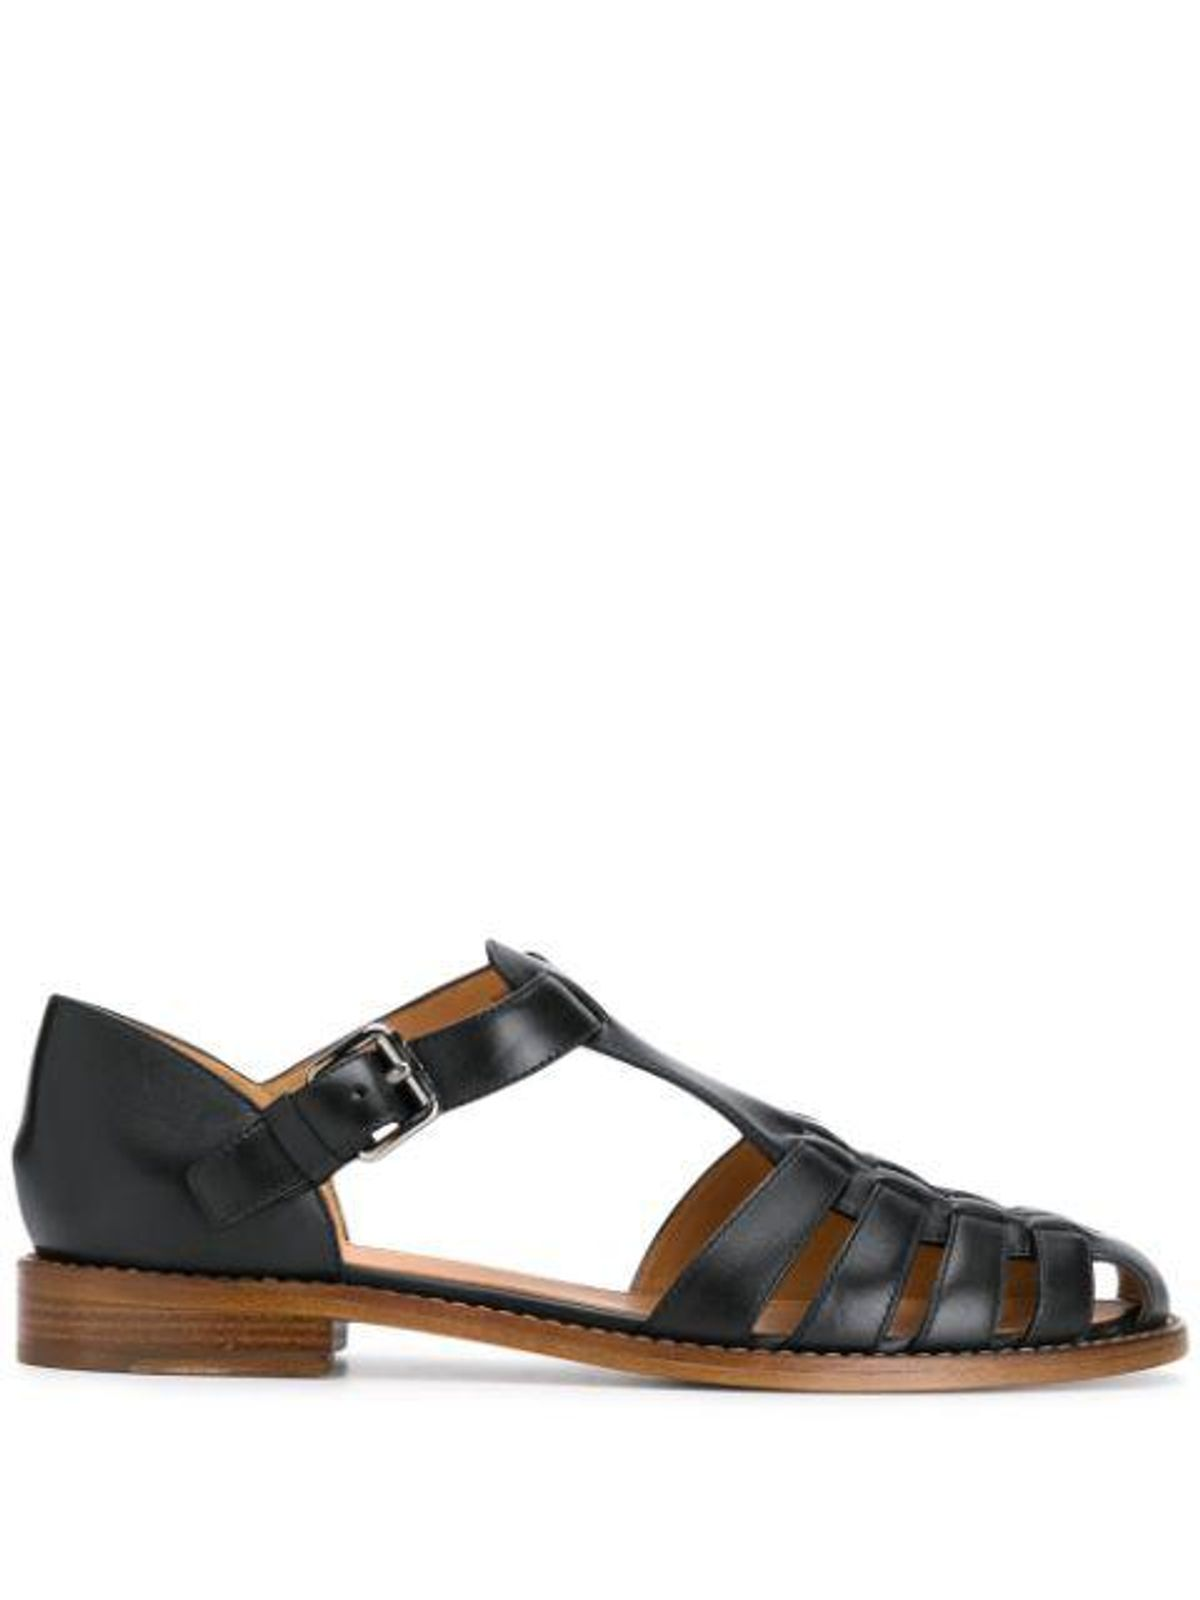 Kelsey Leather Sandals